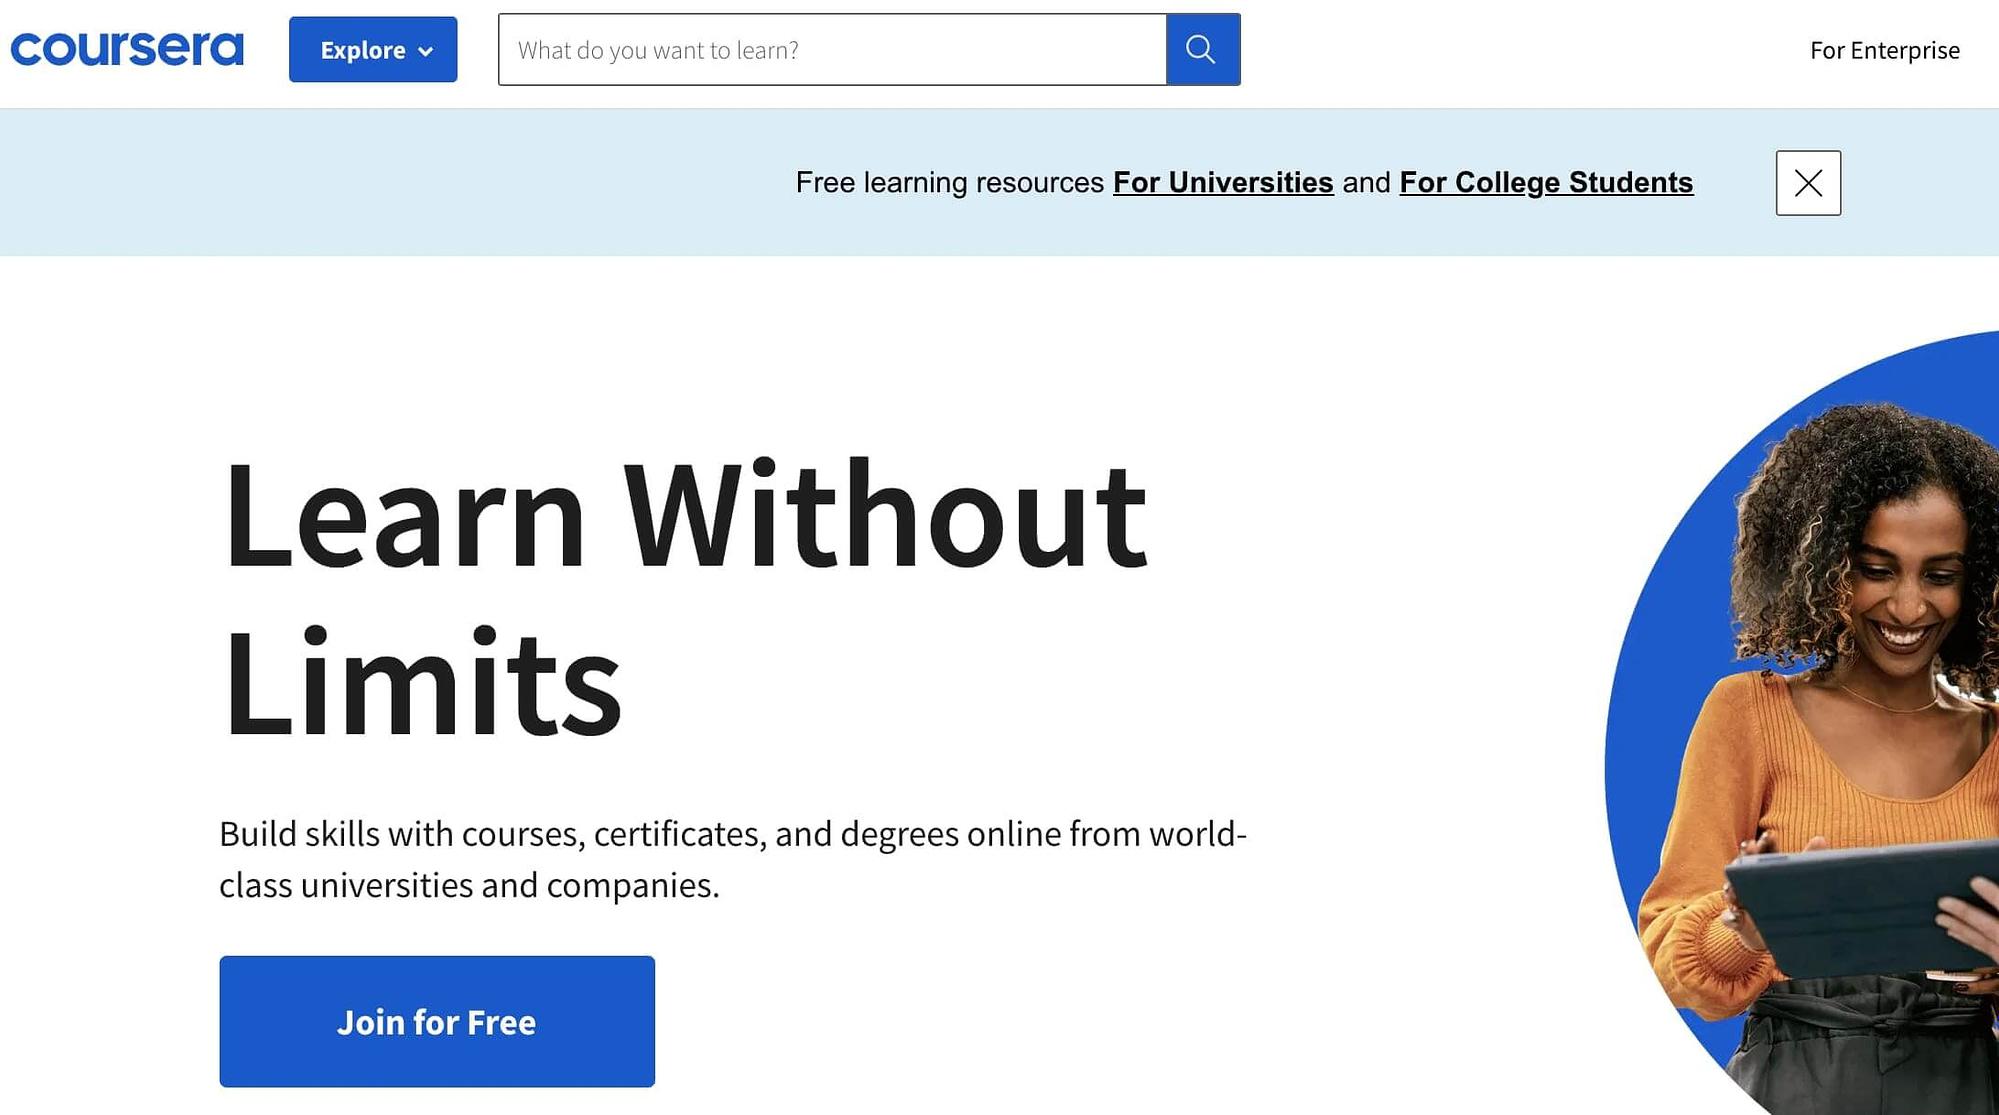 coursera-website